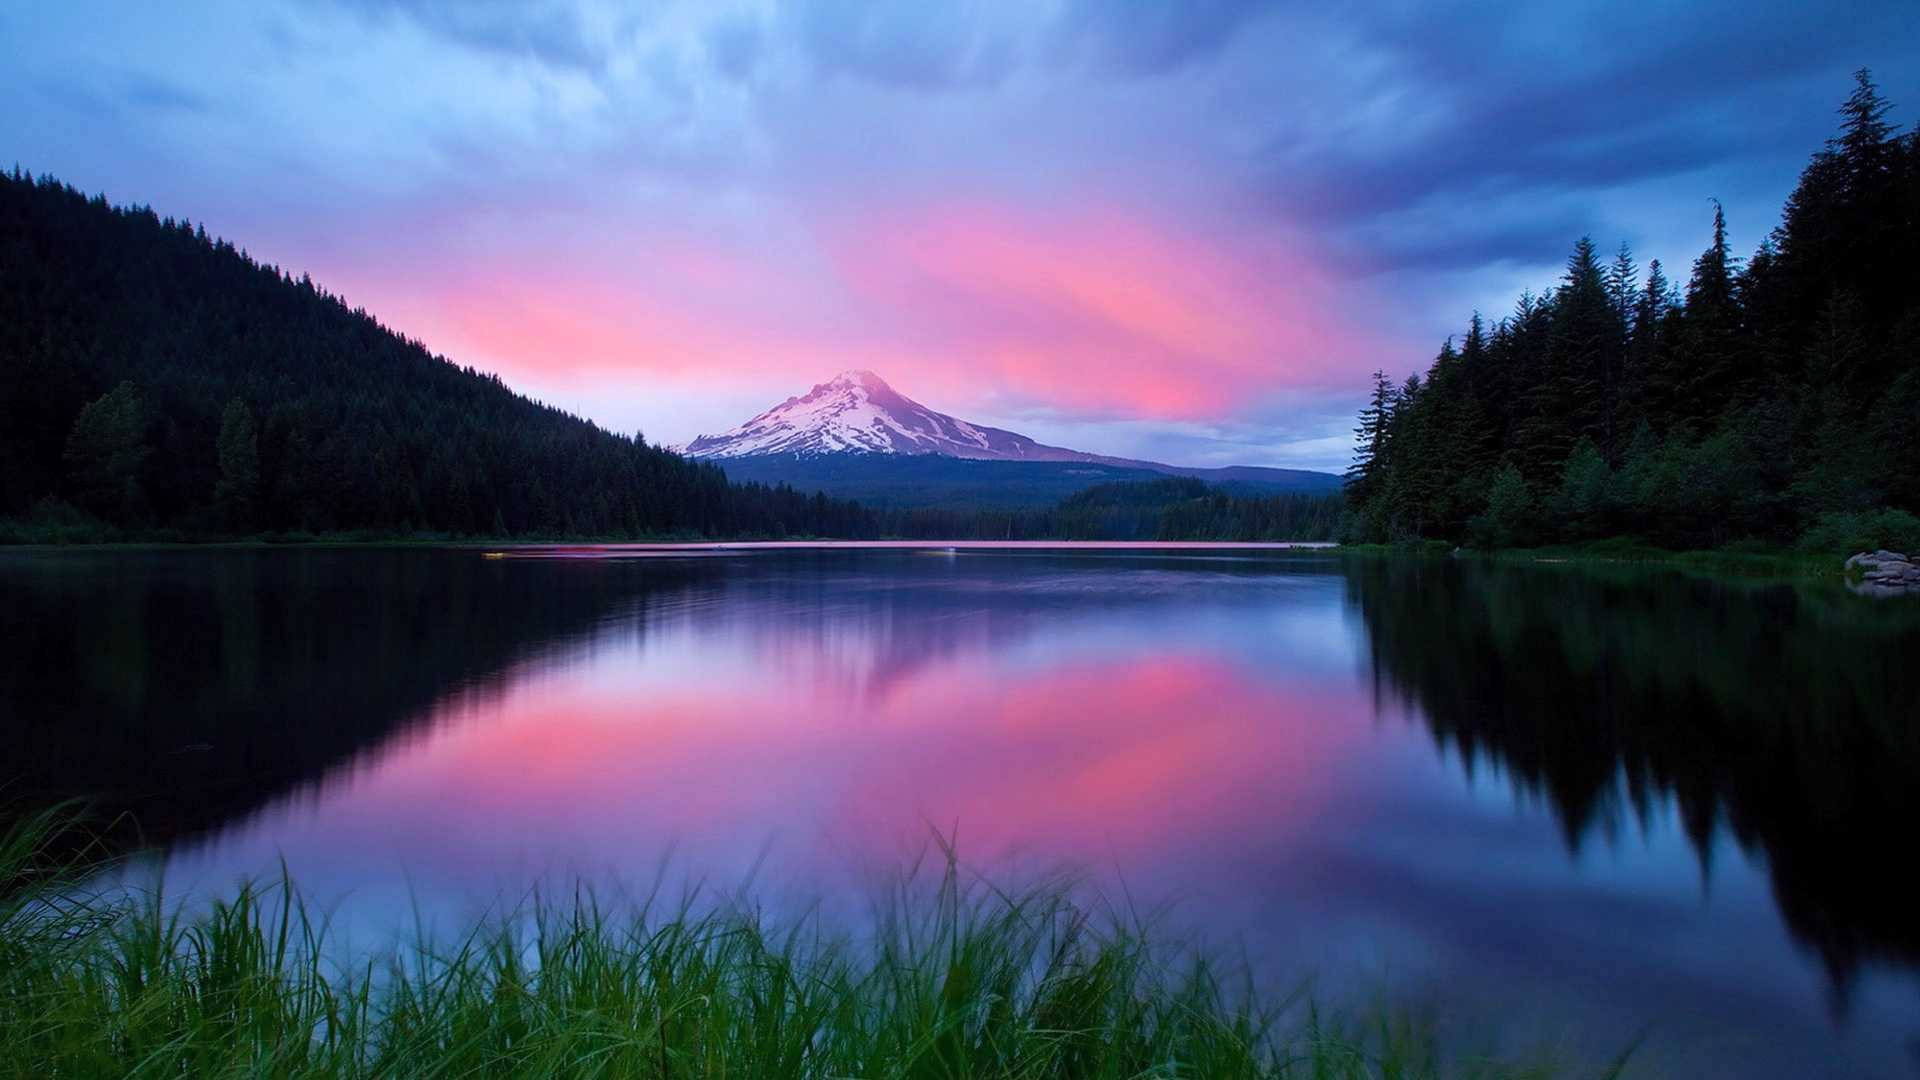 Most Beautiful Nature Wallpaper Free Download Hd Pictures 4 HD Amazing nature pictures download